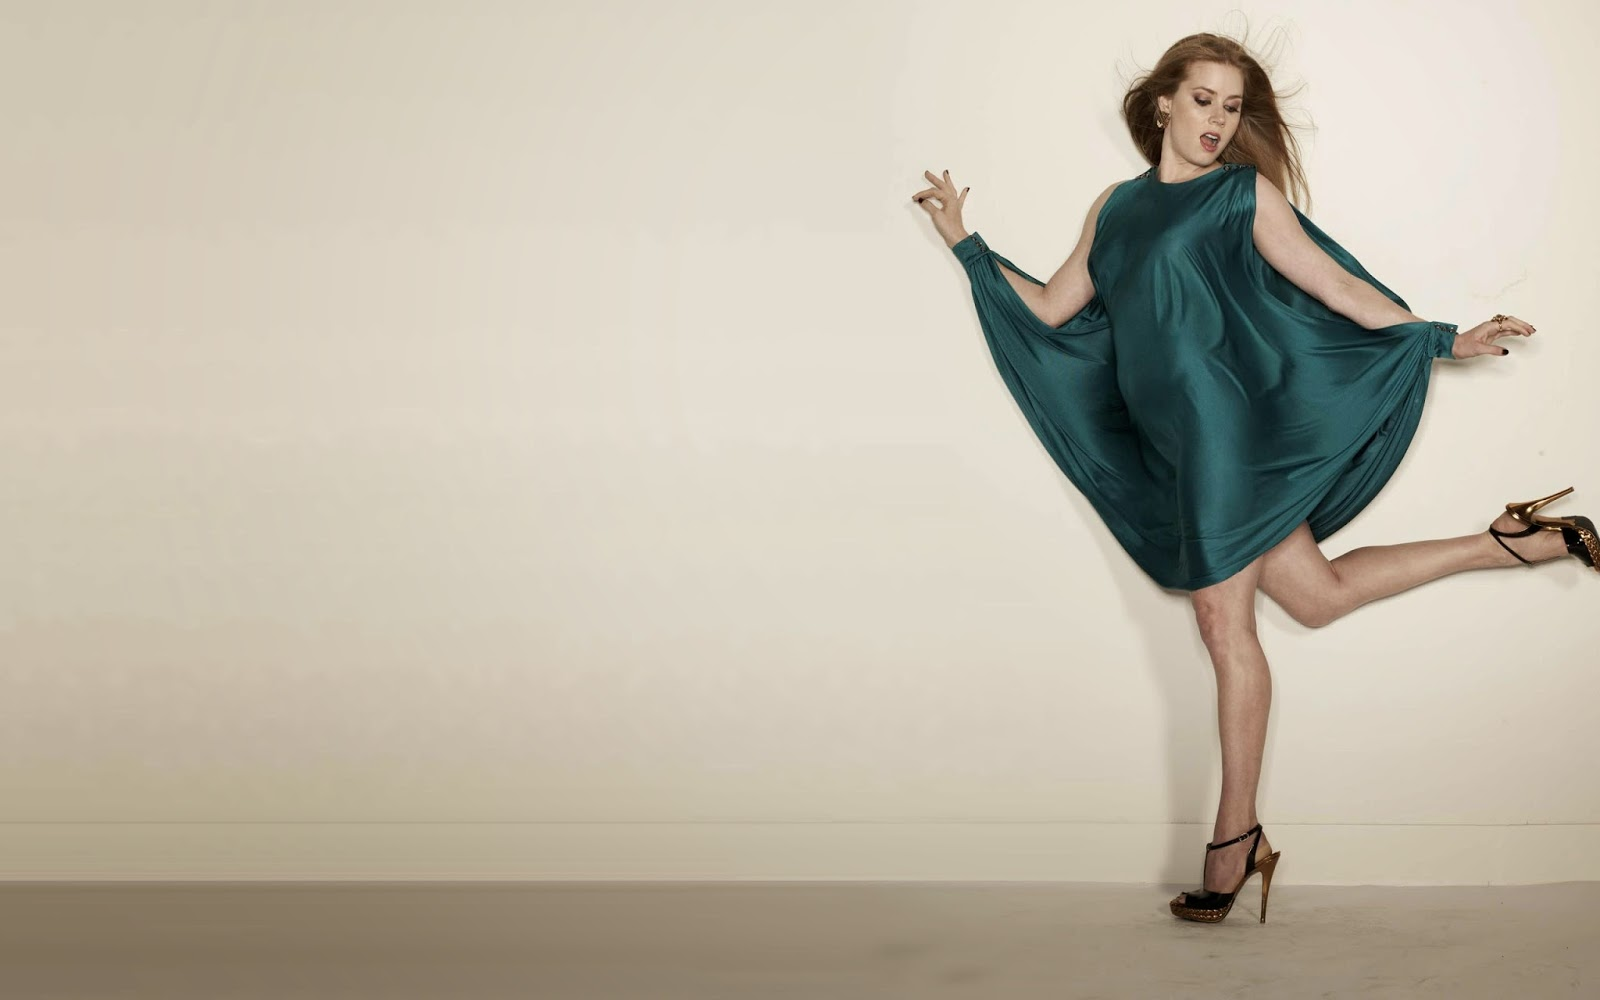 Amy adams big hil in the leg dancing wallpapers